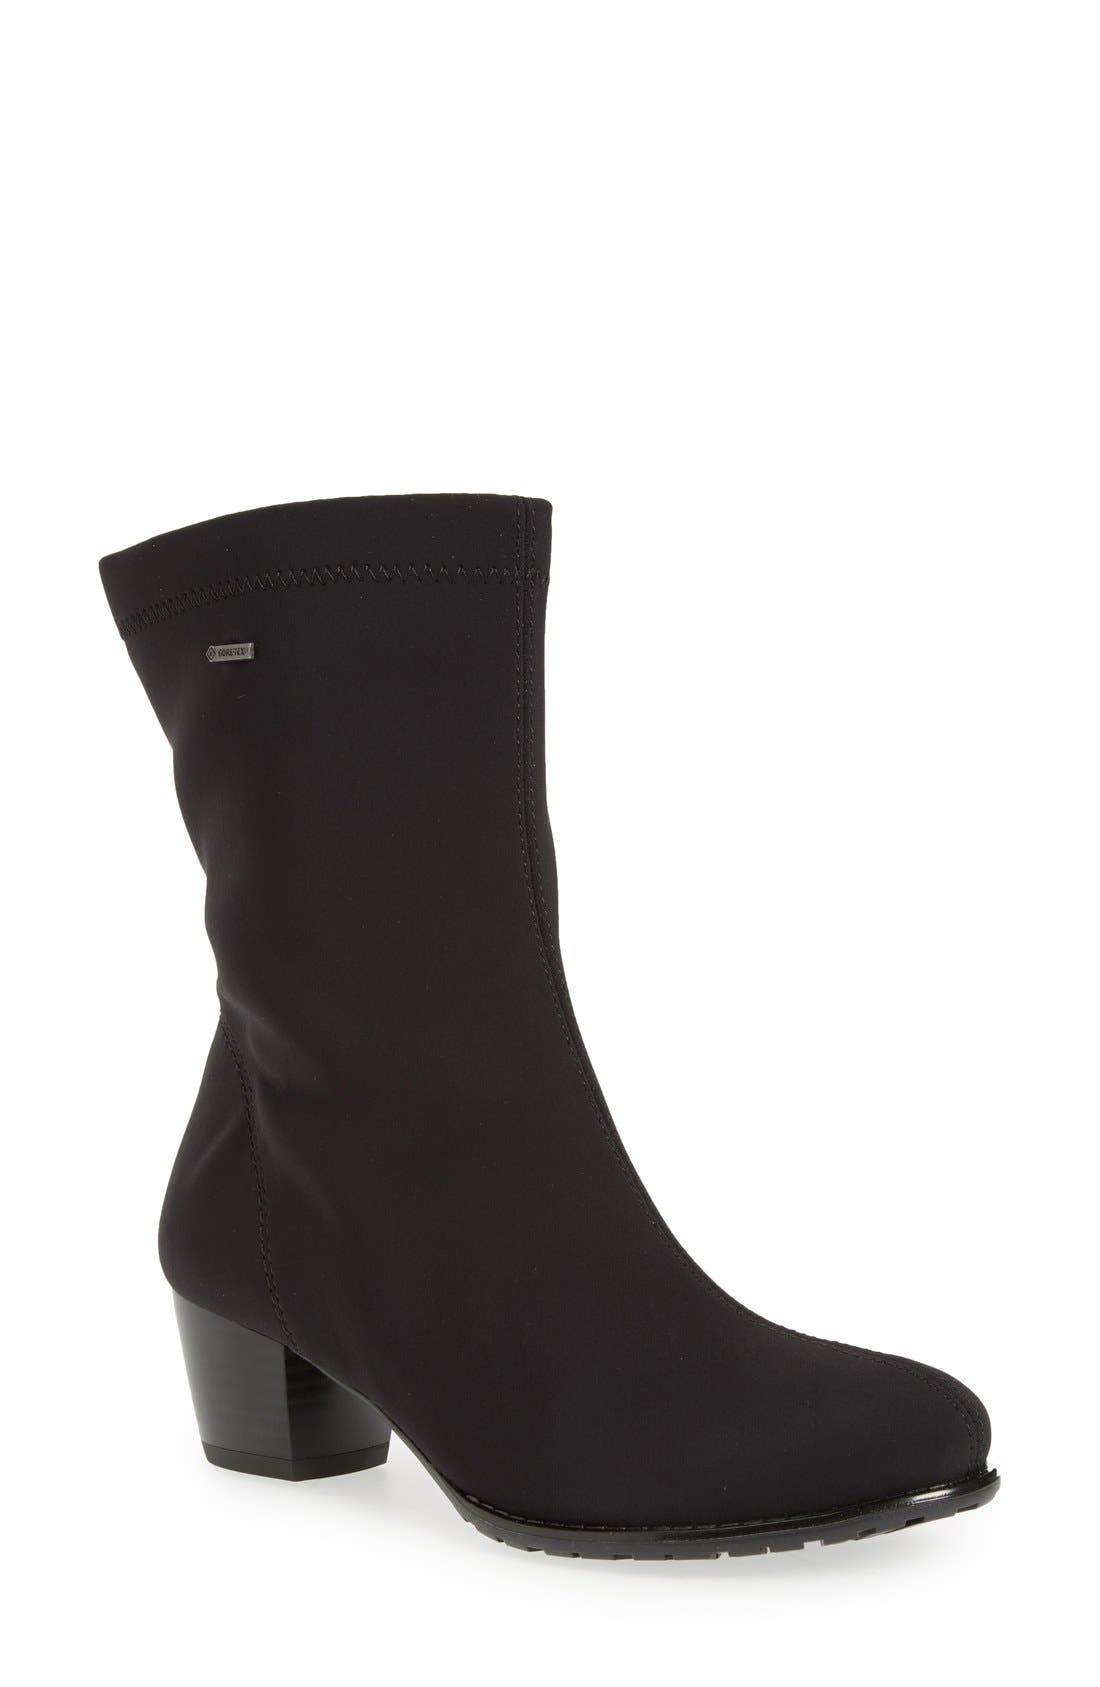 'Fairfax' Waterproof Gore-Tex<sup>®</sup> Block Heel Boot,                             Main thumbnail 1, color,                             001